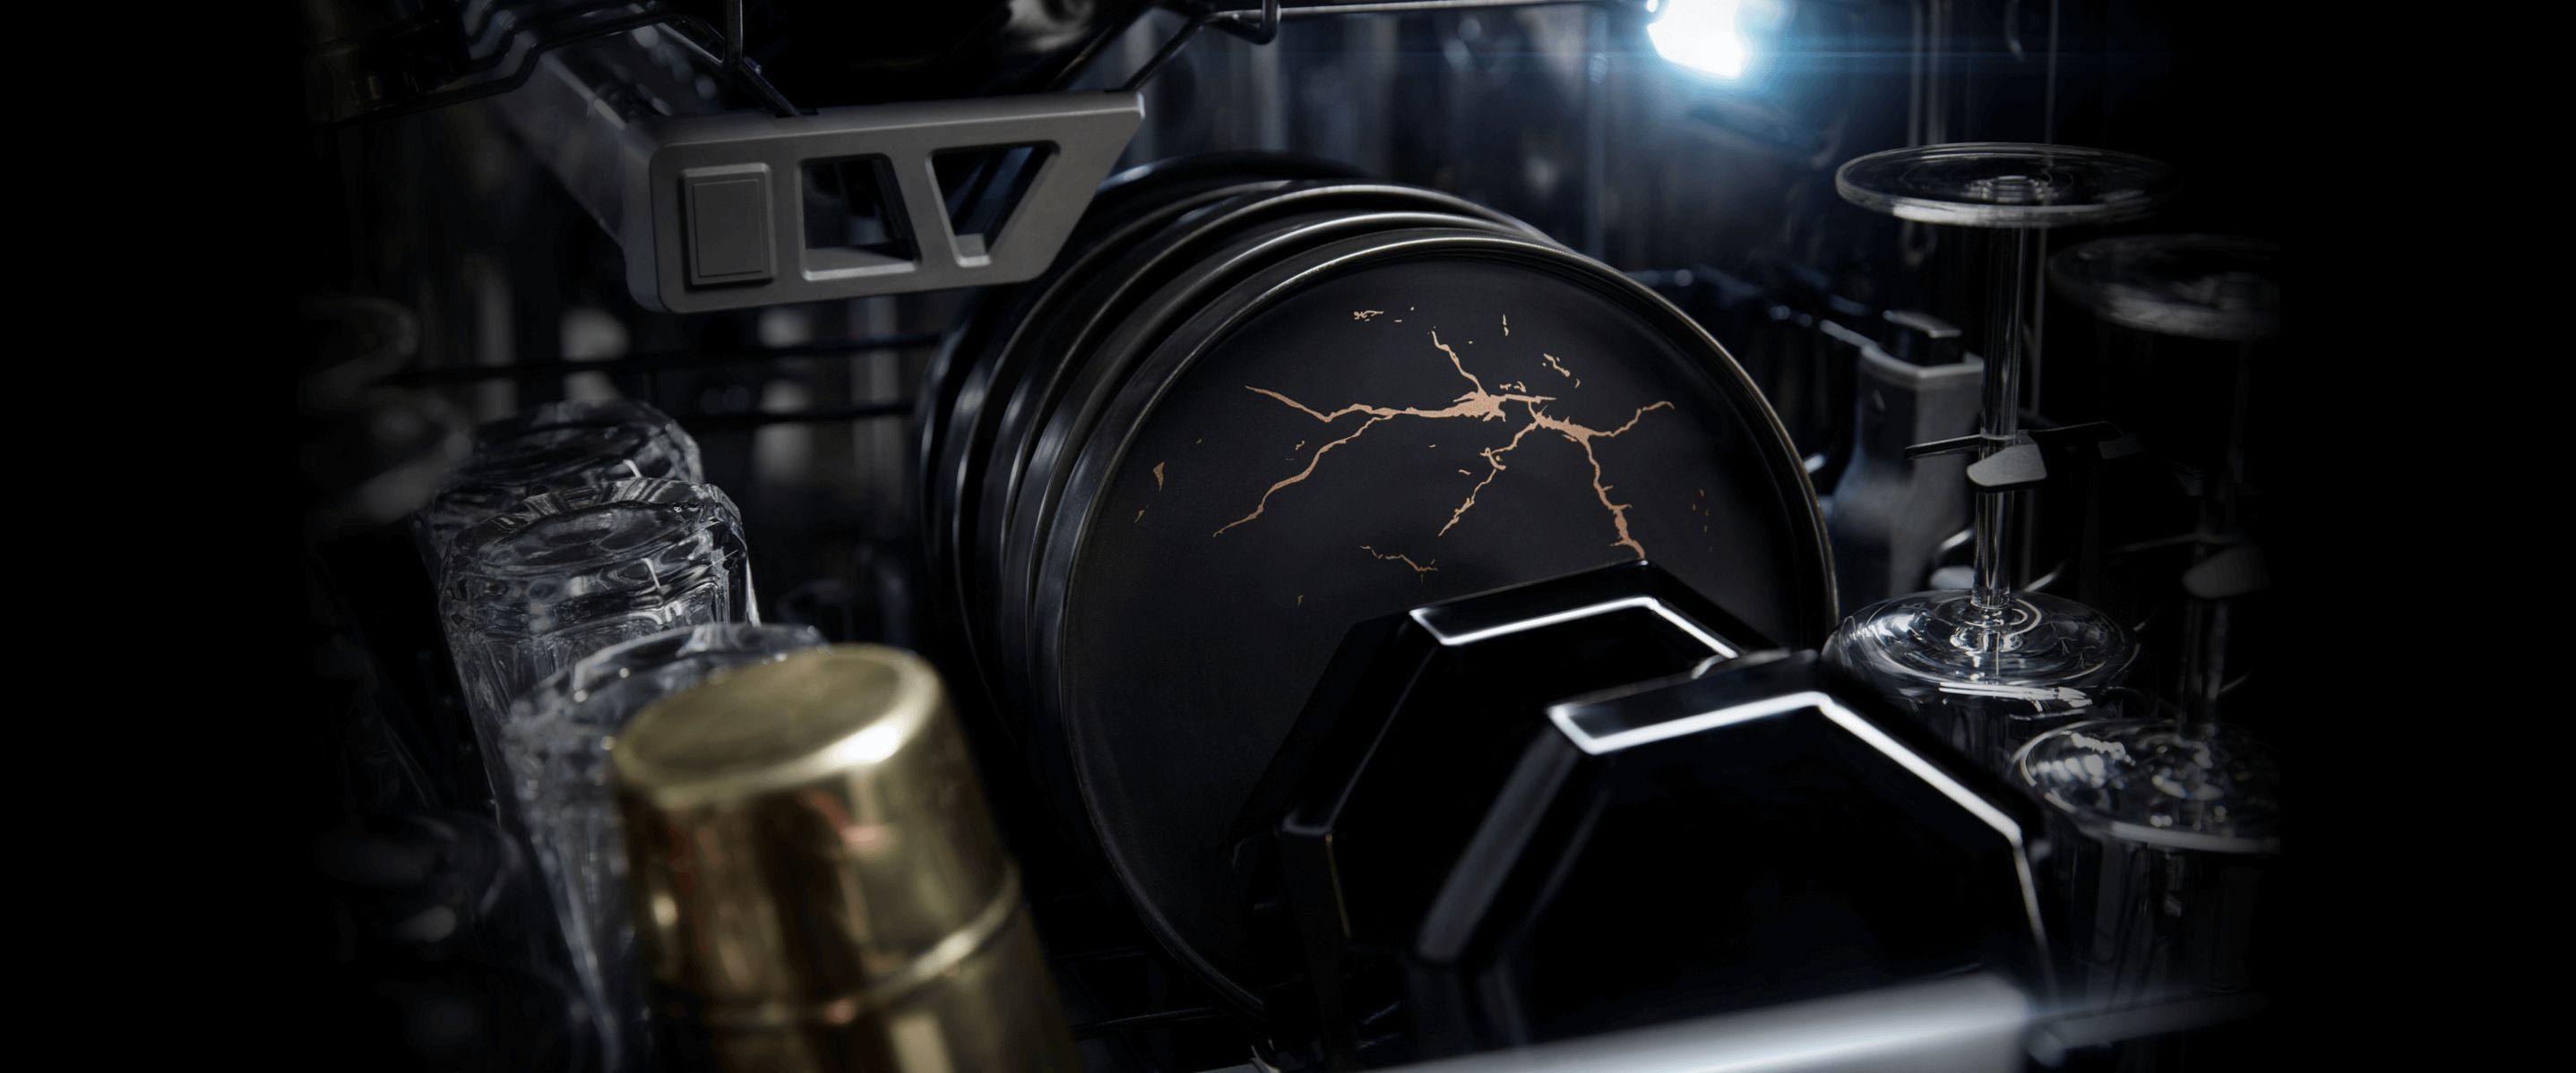 Marbled dishes inside a JennAir® dishwasher.